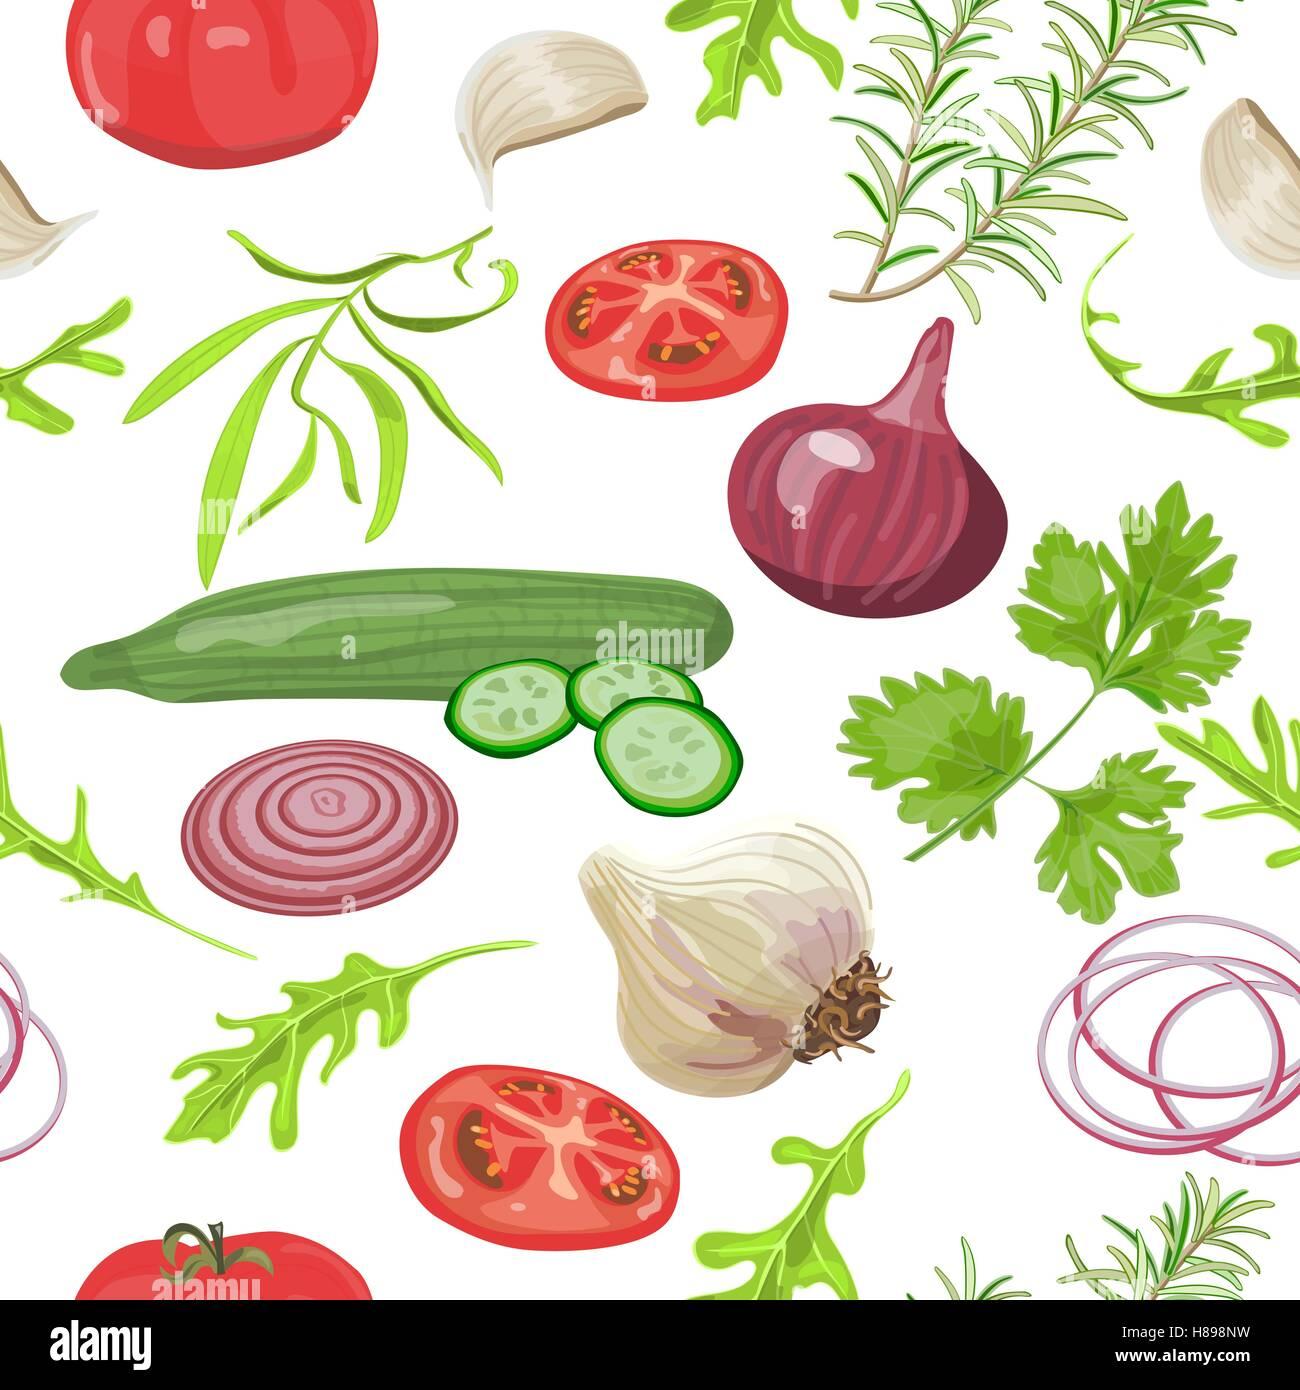 Seamless pattern herbs and vegetables. Tomato, cucumber, onion, garlic, parsley arugula Vector illustration - Stock Vector